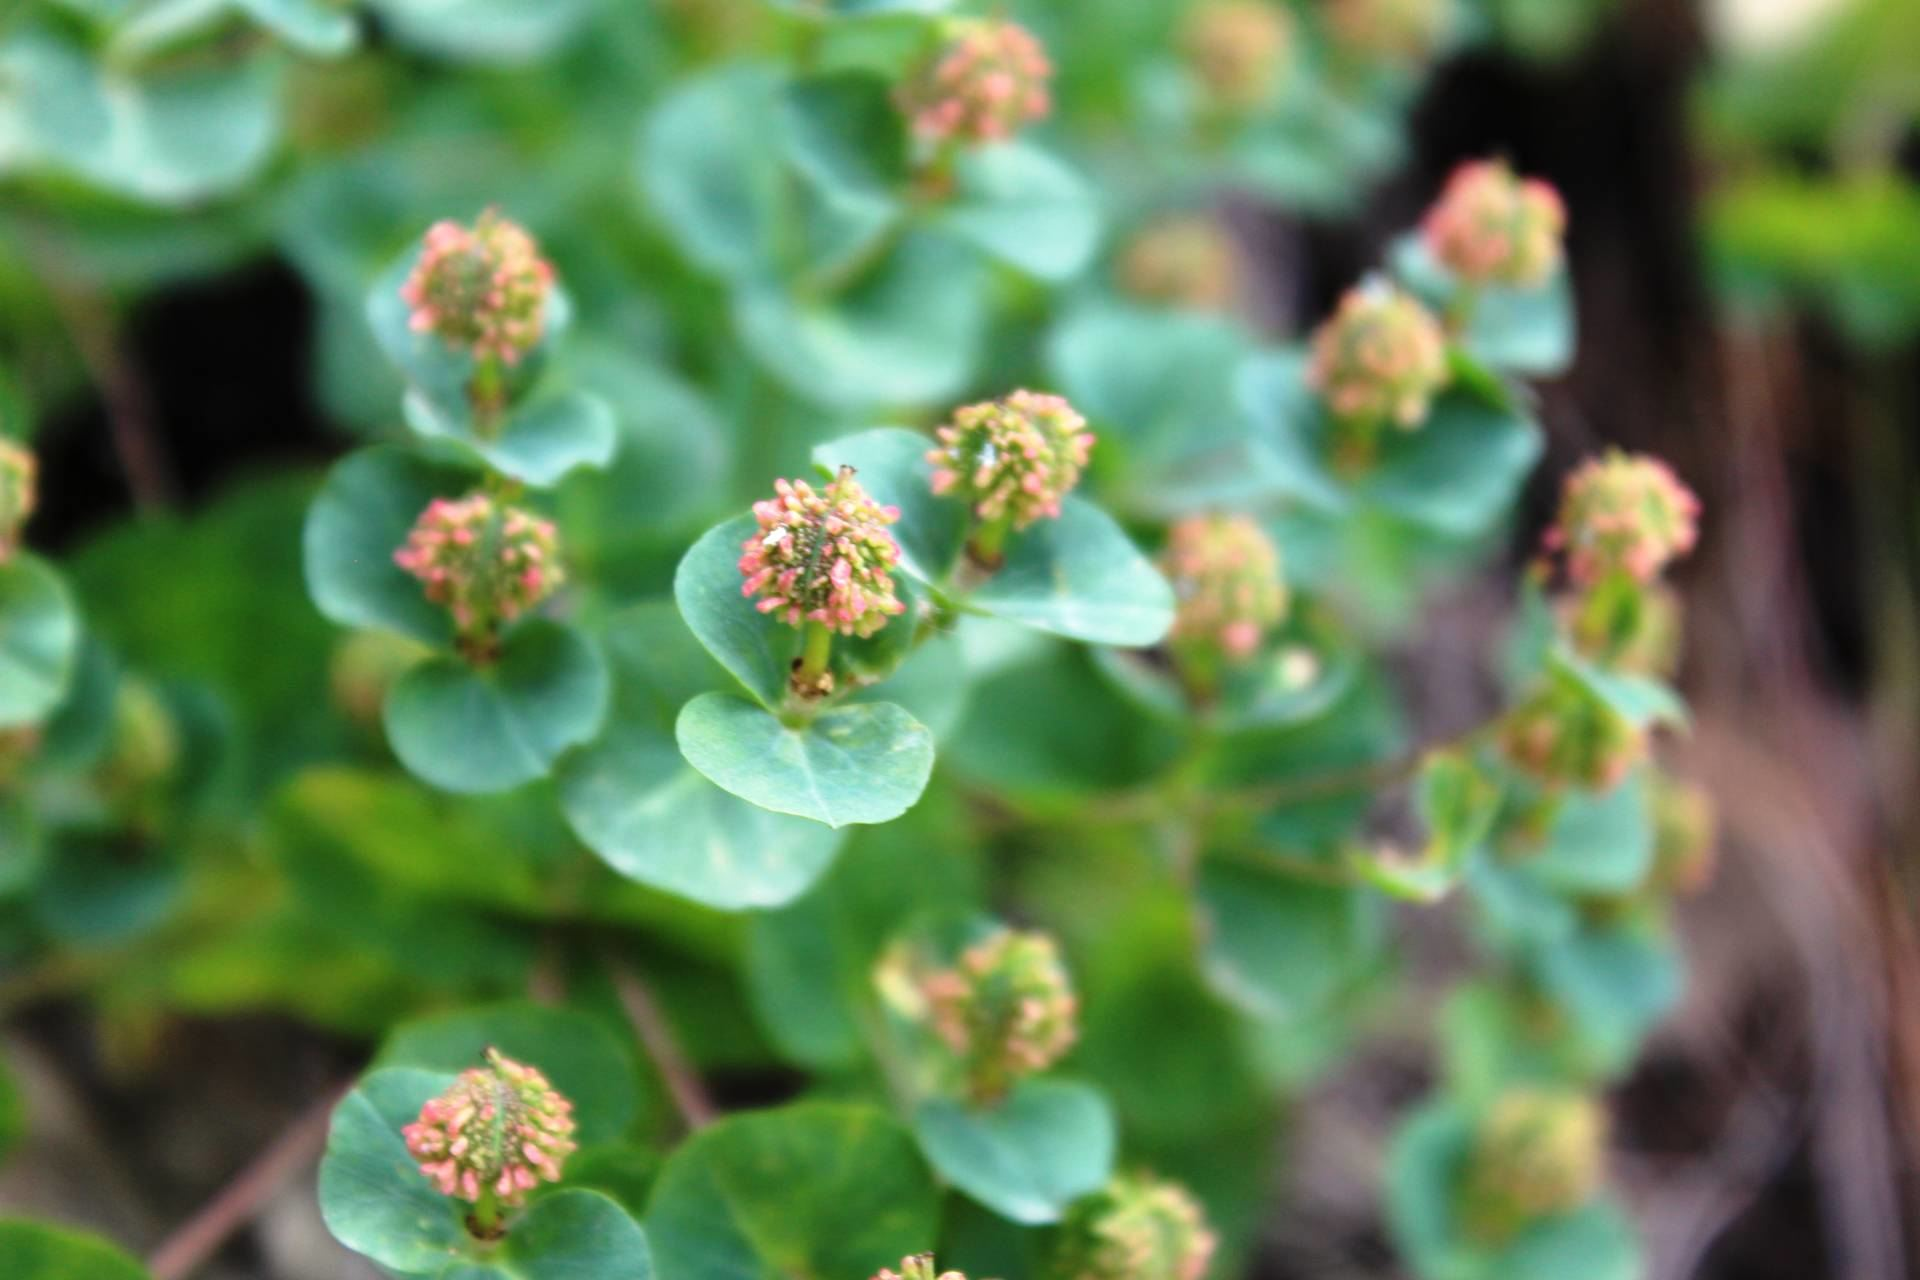 Euphorbia macrocarpa Boiss. & Buhse